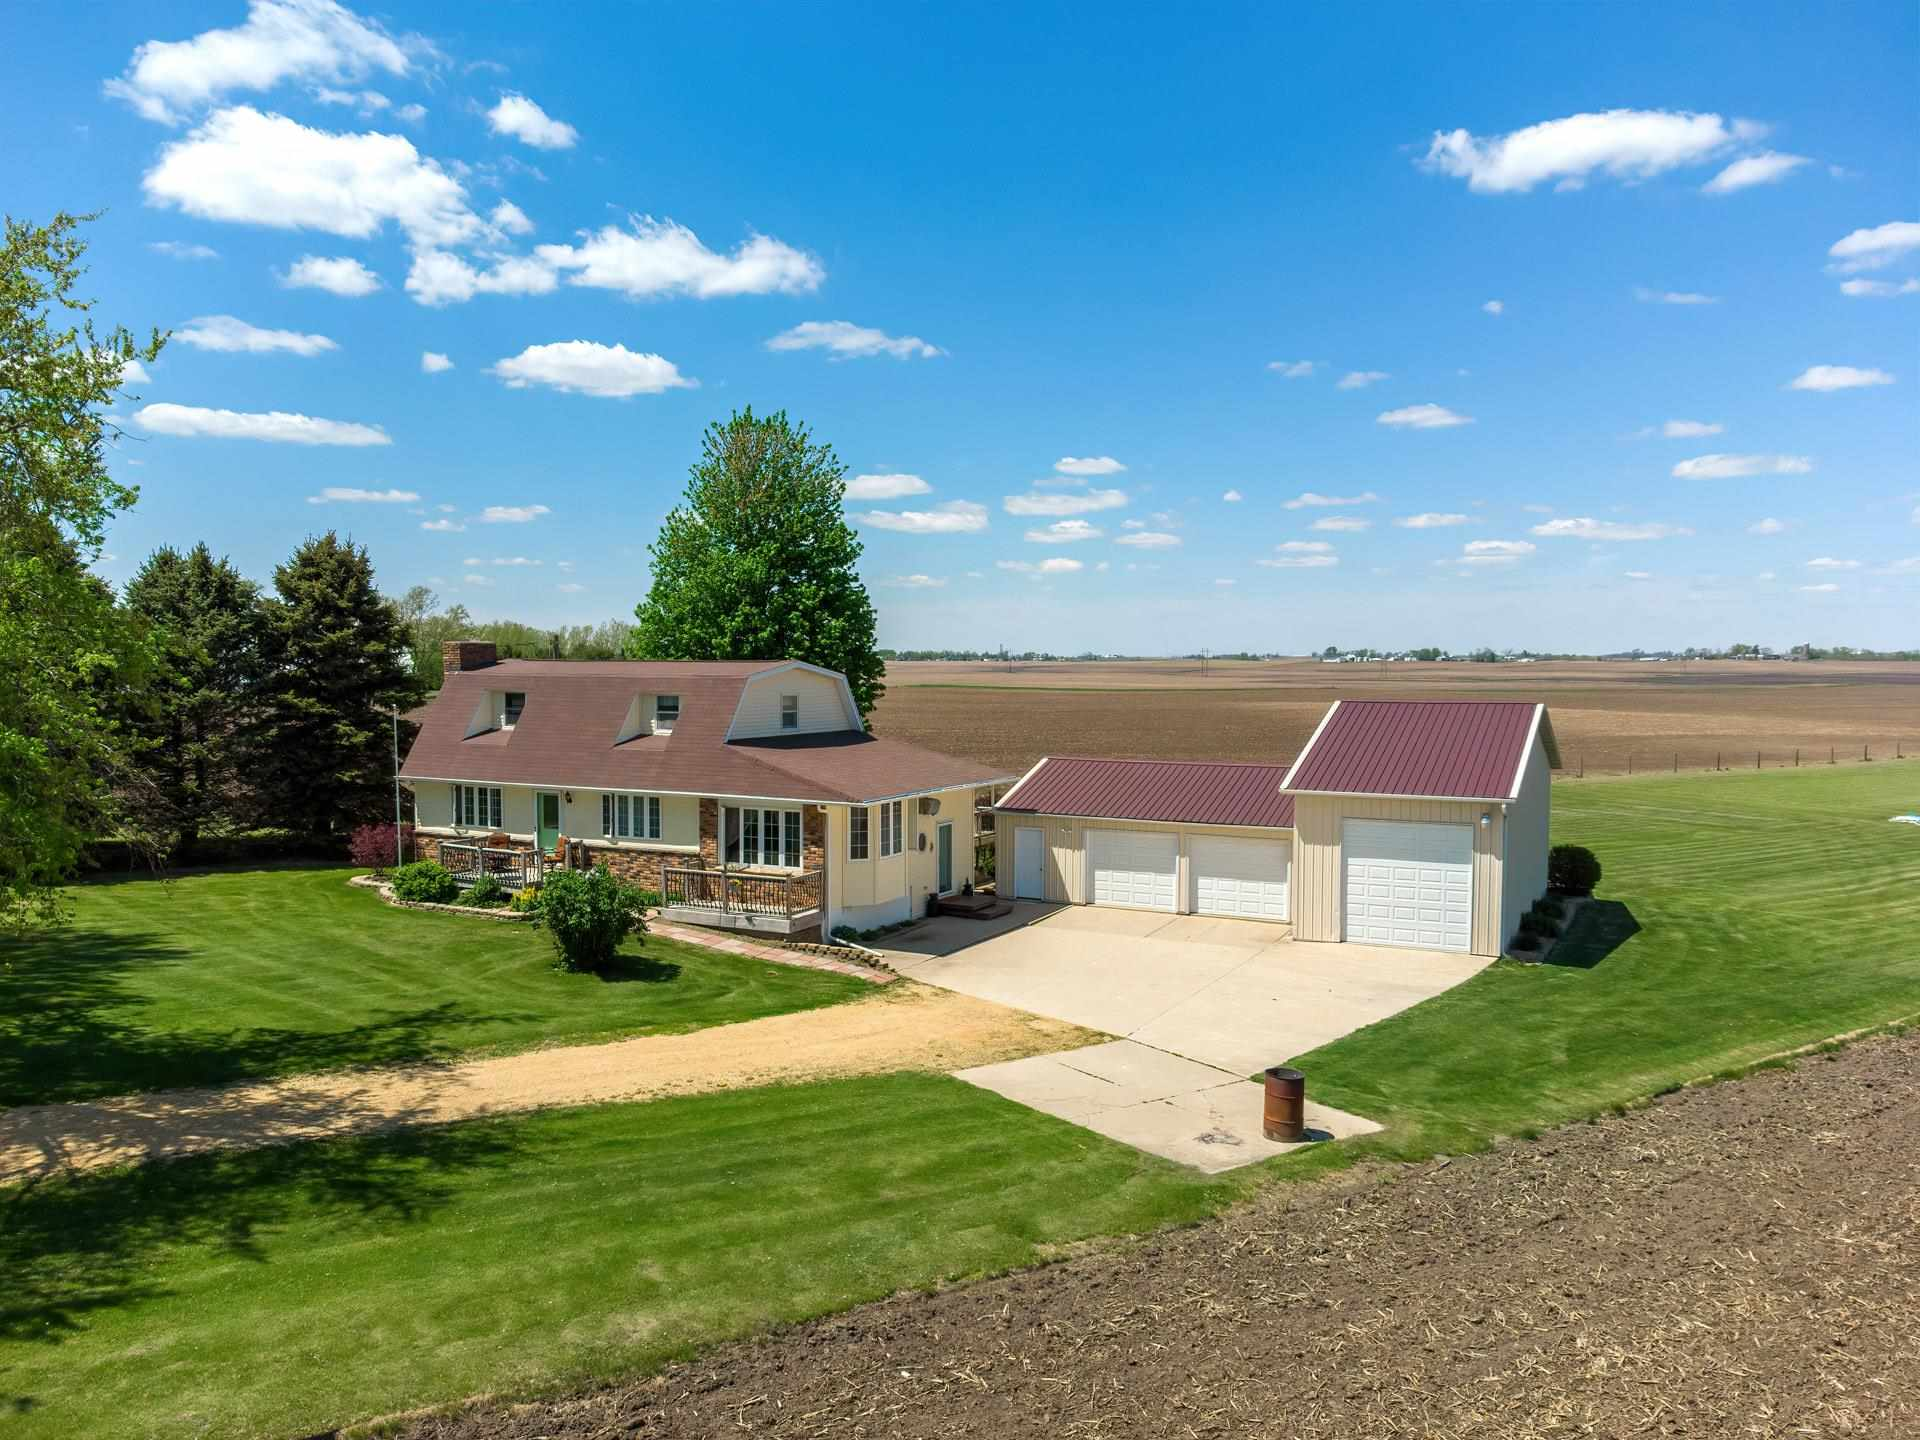 2462 255TH Property Photo - De Witt, IA real estate listing